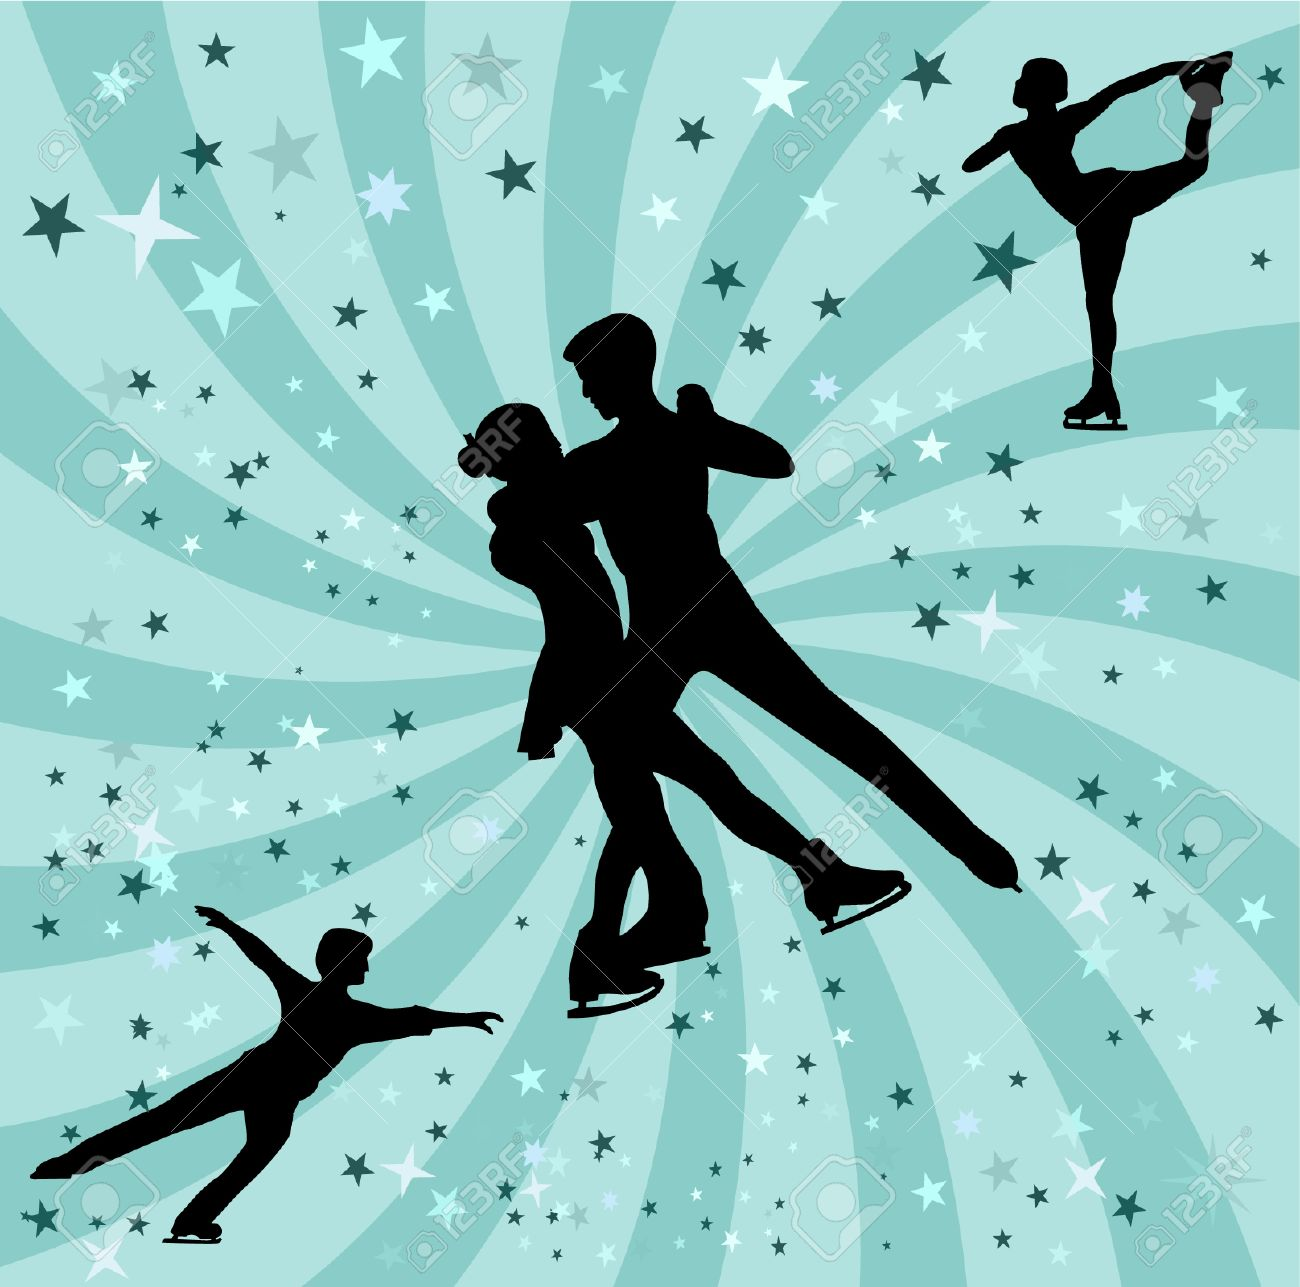 figure skating silhouette - vectors Stock Vector - 5500729